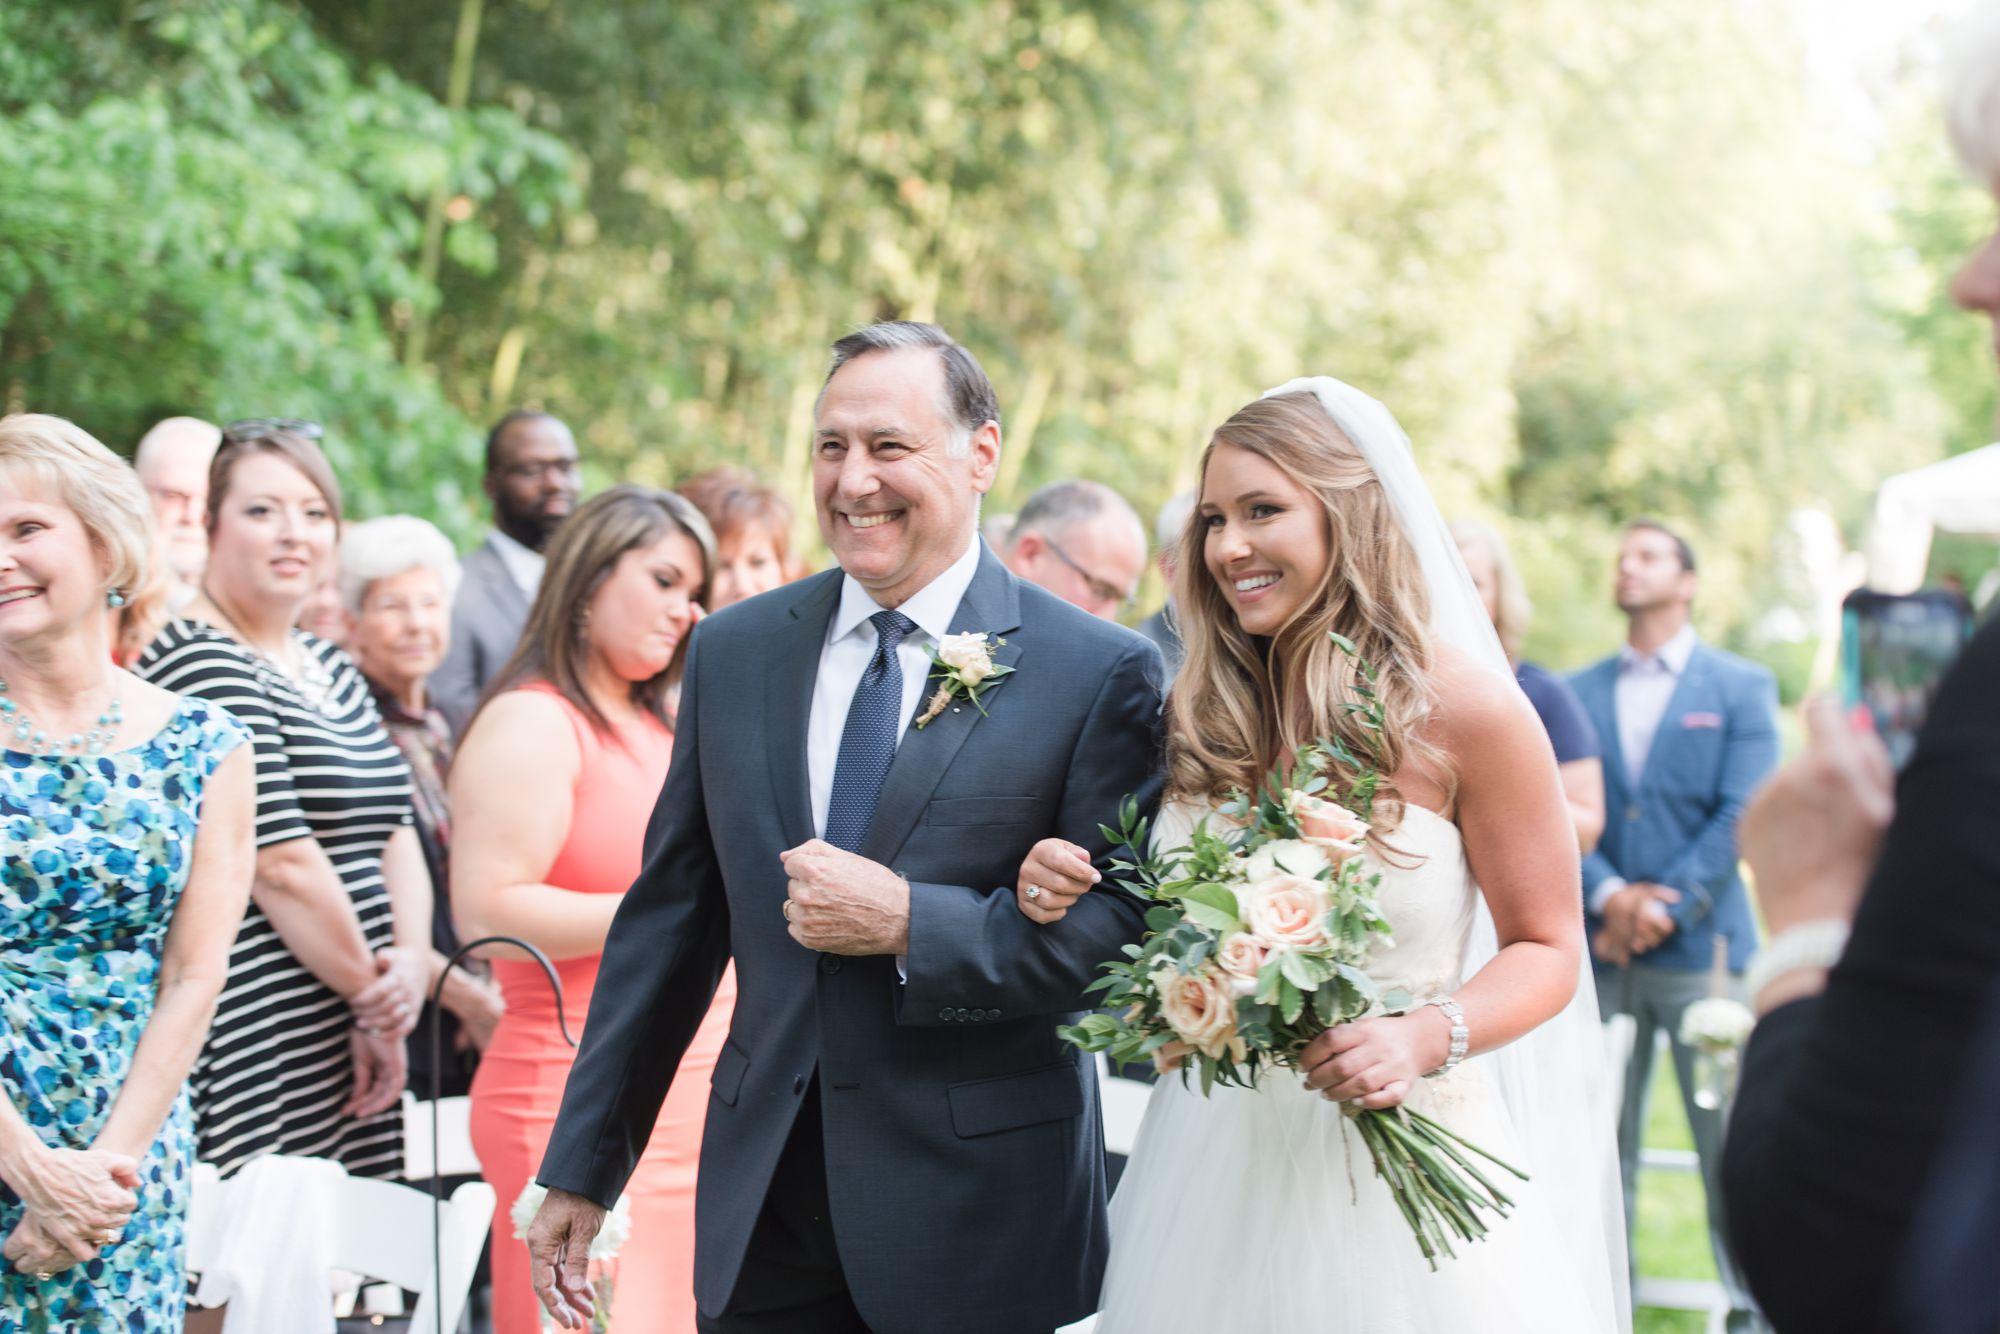 beaver-dam-house-davidson-nc-wedding-photos 47